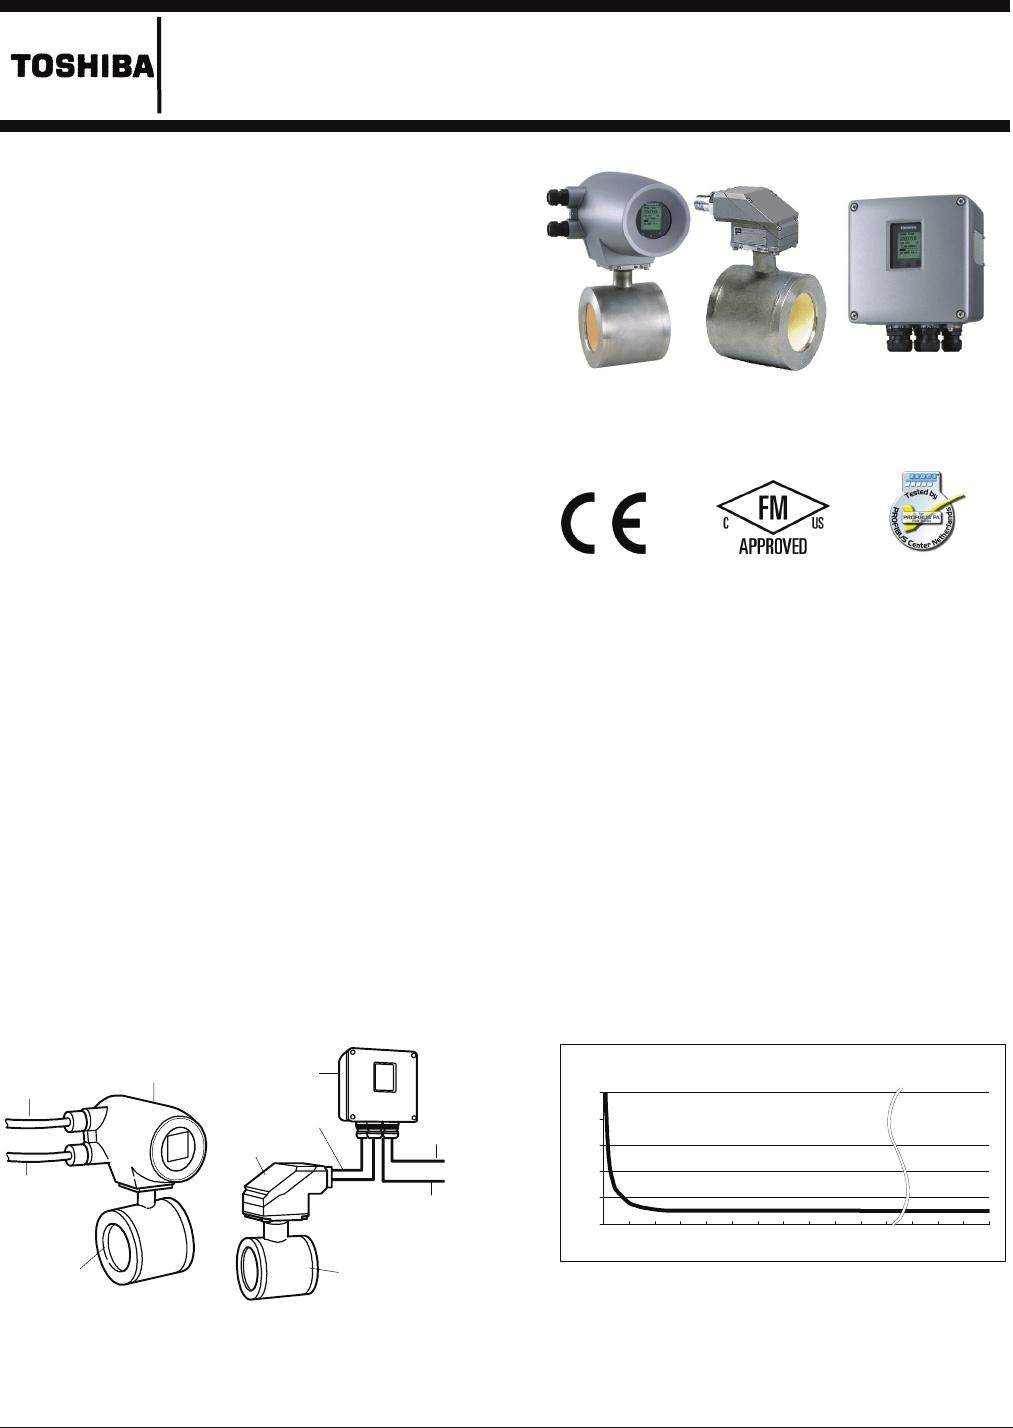 Toshiba LF410LF602 LF410_EJL114B_ User Manual To The